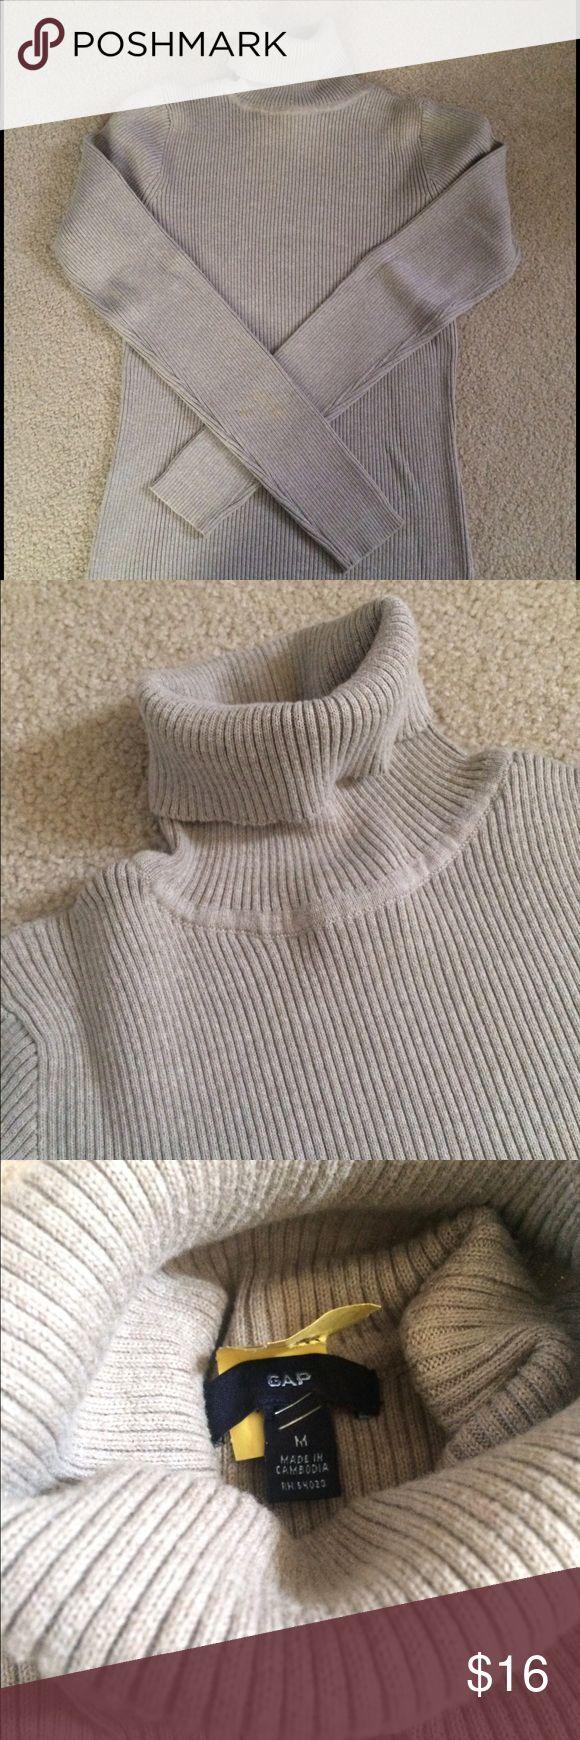 Women's turtleneck sweater Gap Gap women's turtleneck sweater tan color dry cleaned in excellent condition GAP Sweaters Cowl & Turtlenecks